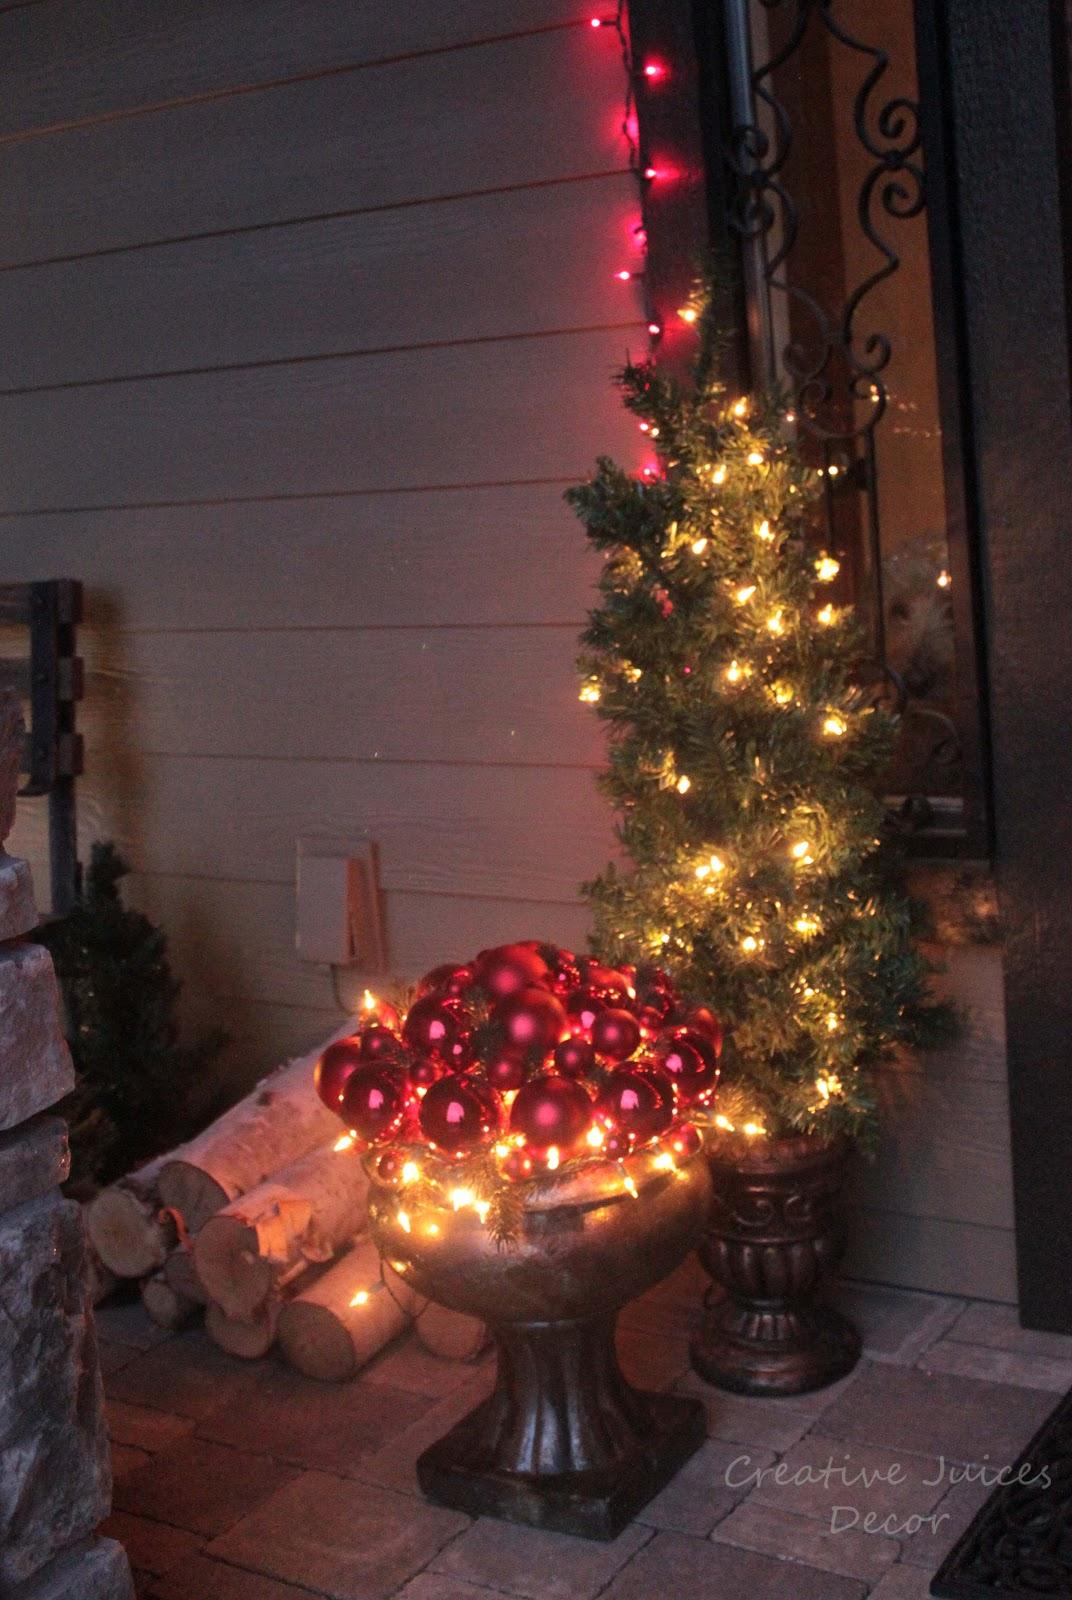 Creative Juices Decor A Rustic Christmas Front Porch